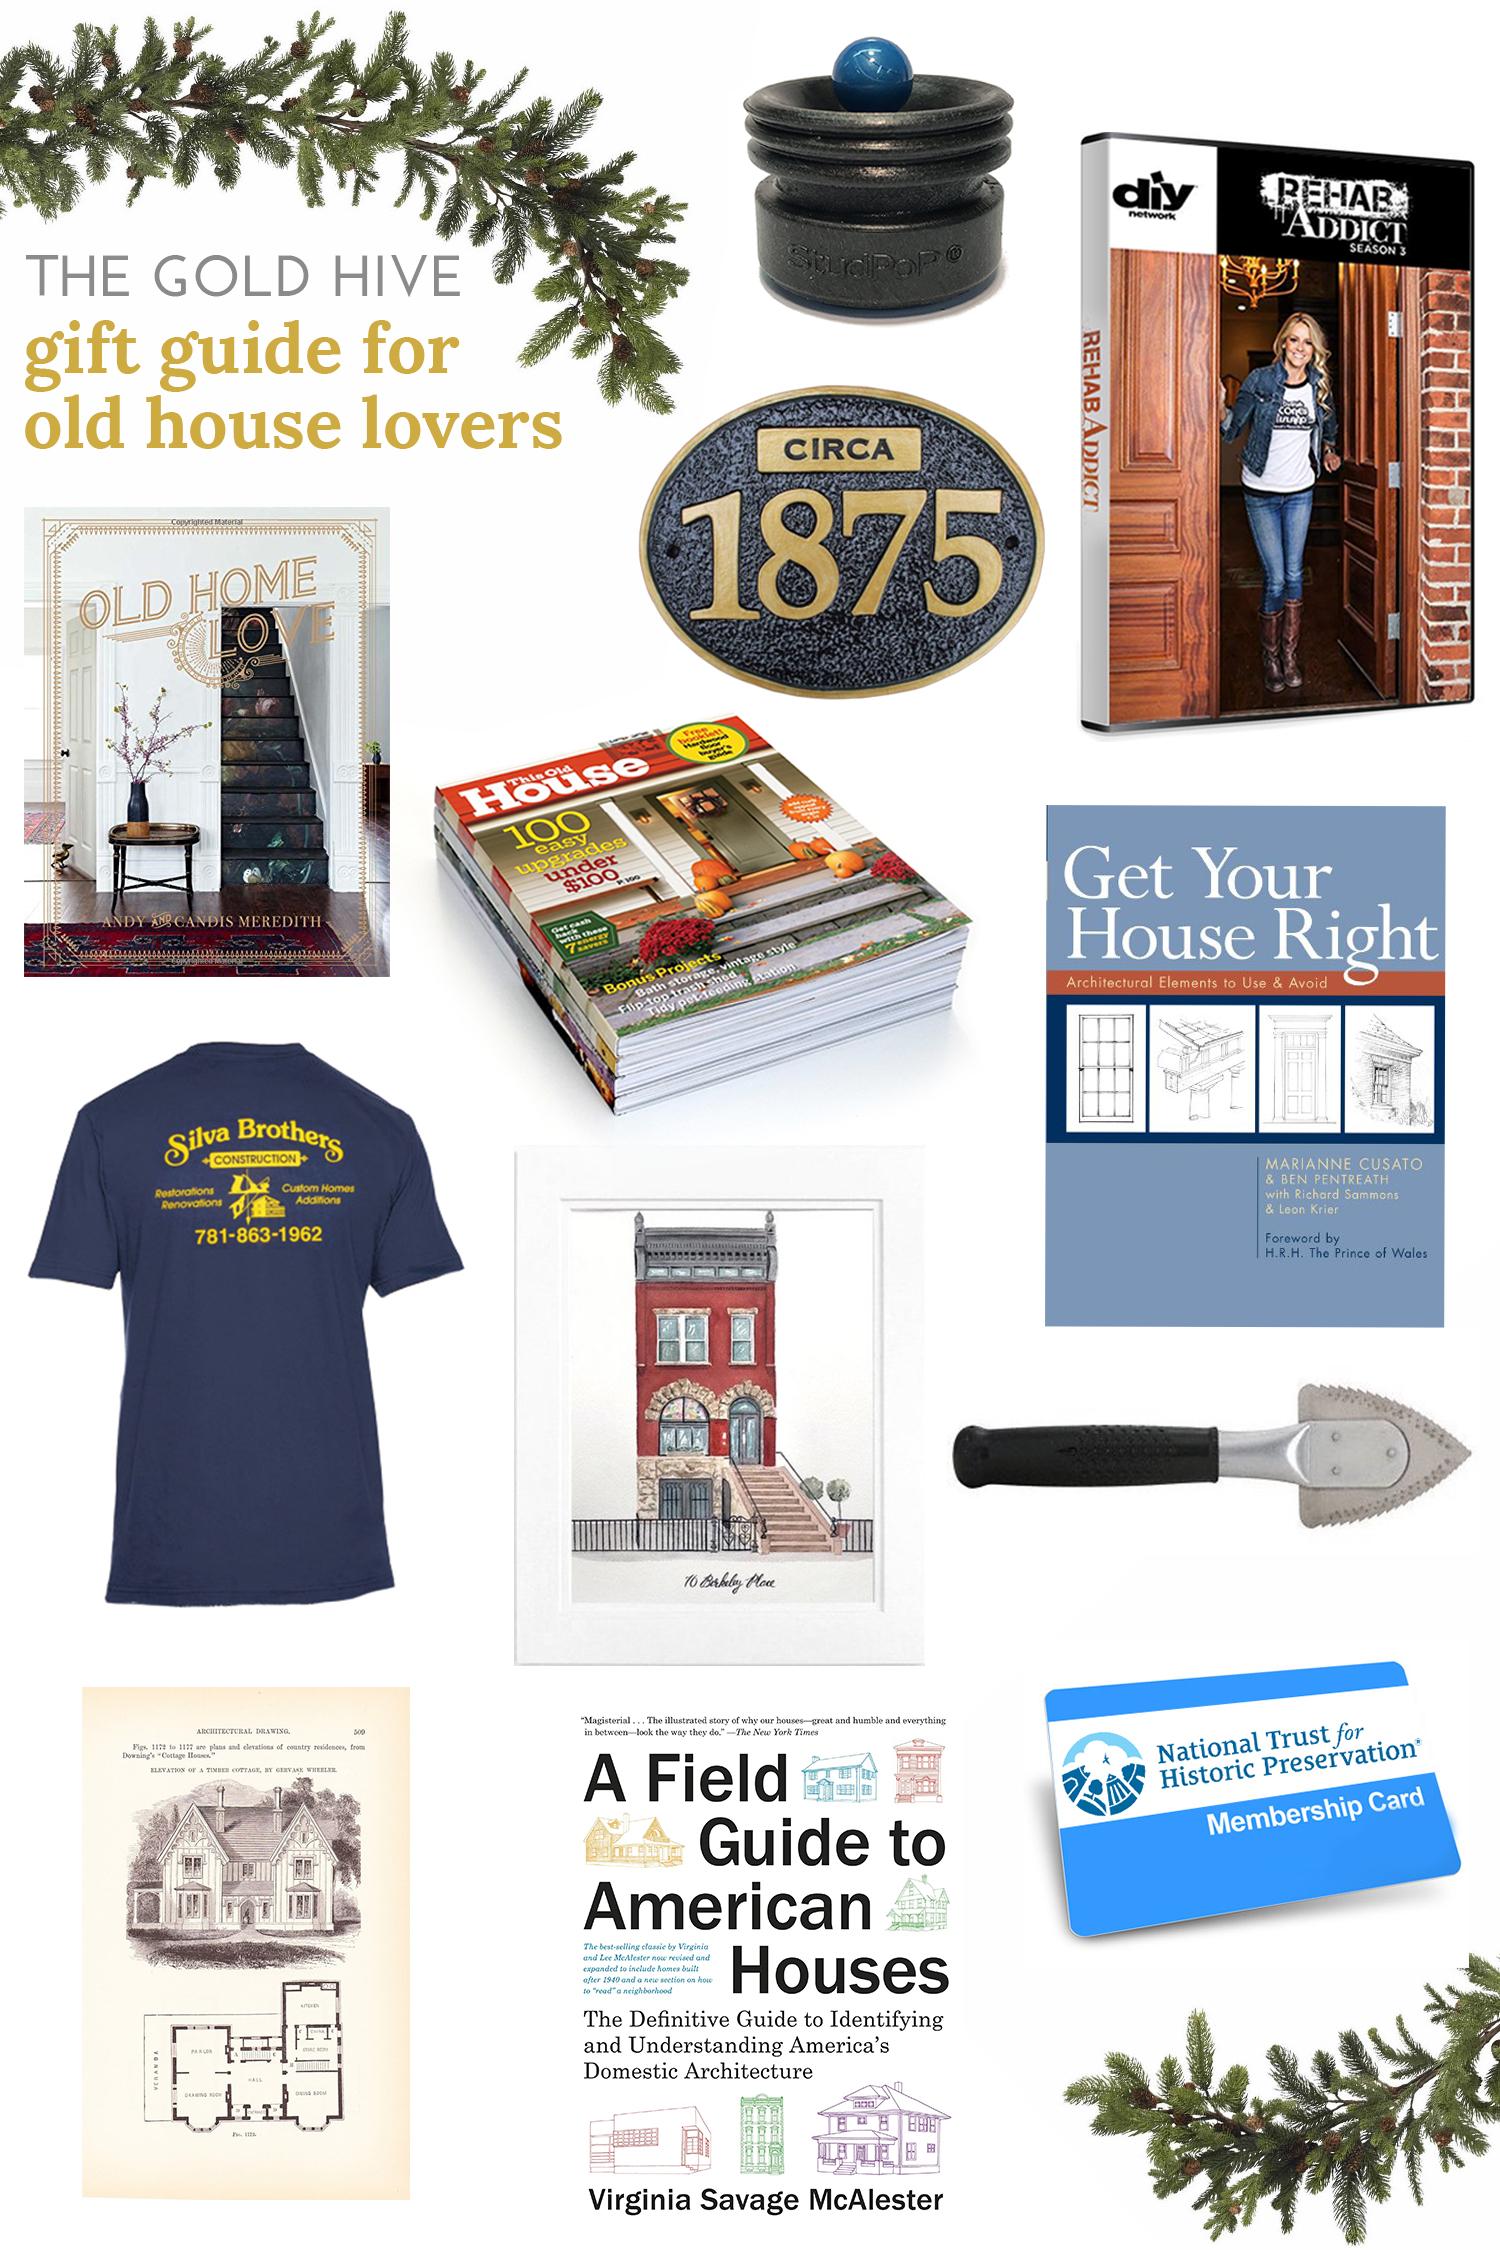 gift guide for old house lovers.jpg